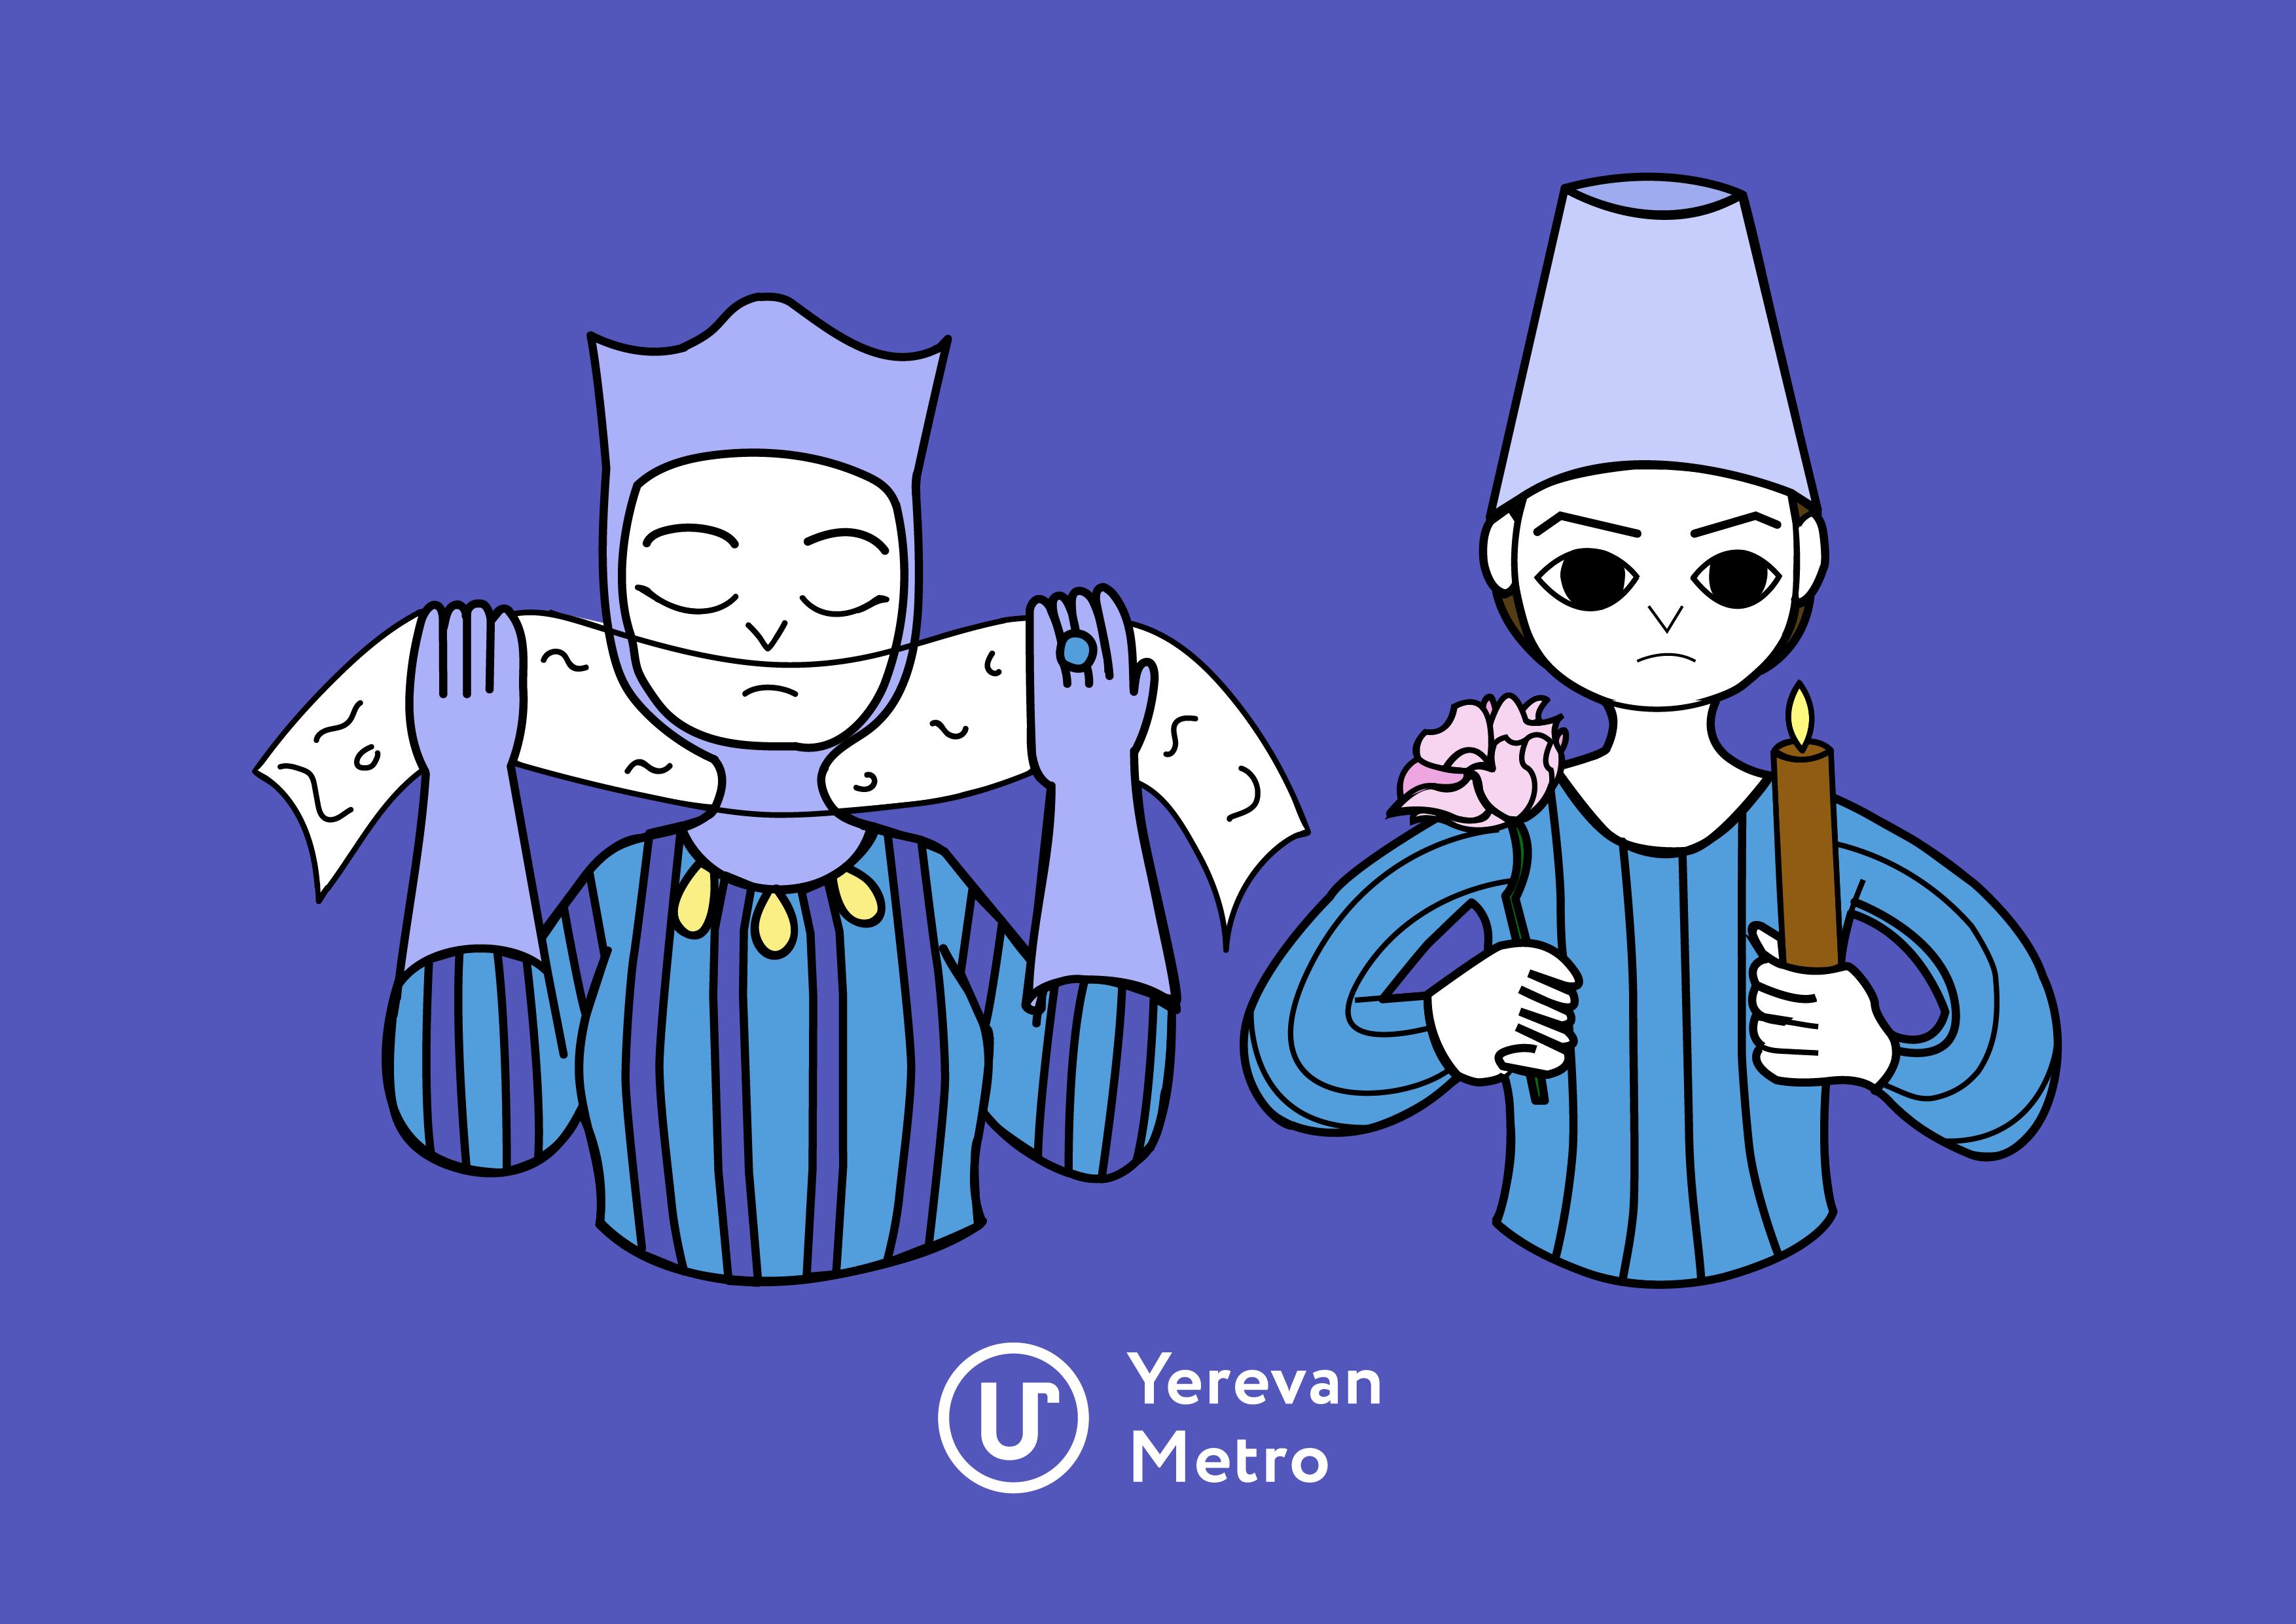 Erevan metro banner the color ofpomegranates Монтажная область 1 - Illustrating Metro Passes with Natasha Dzola